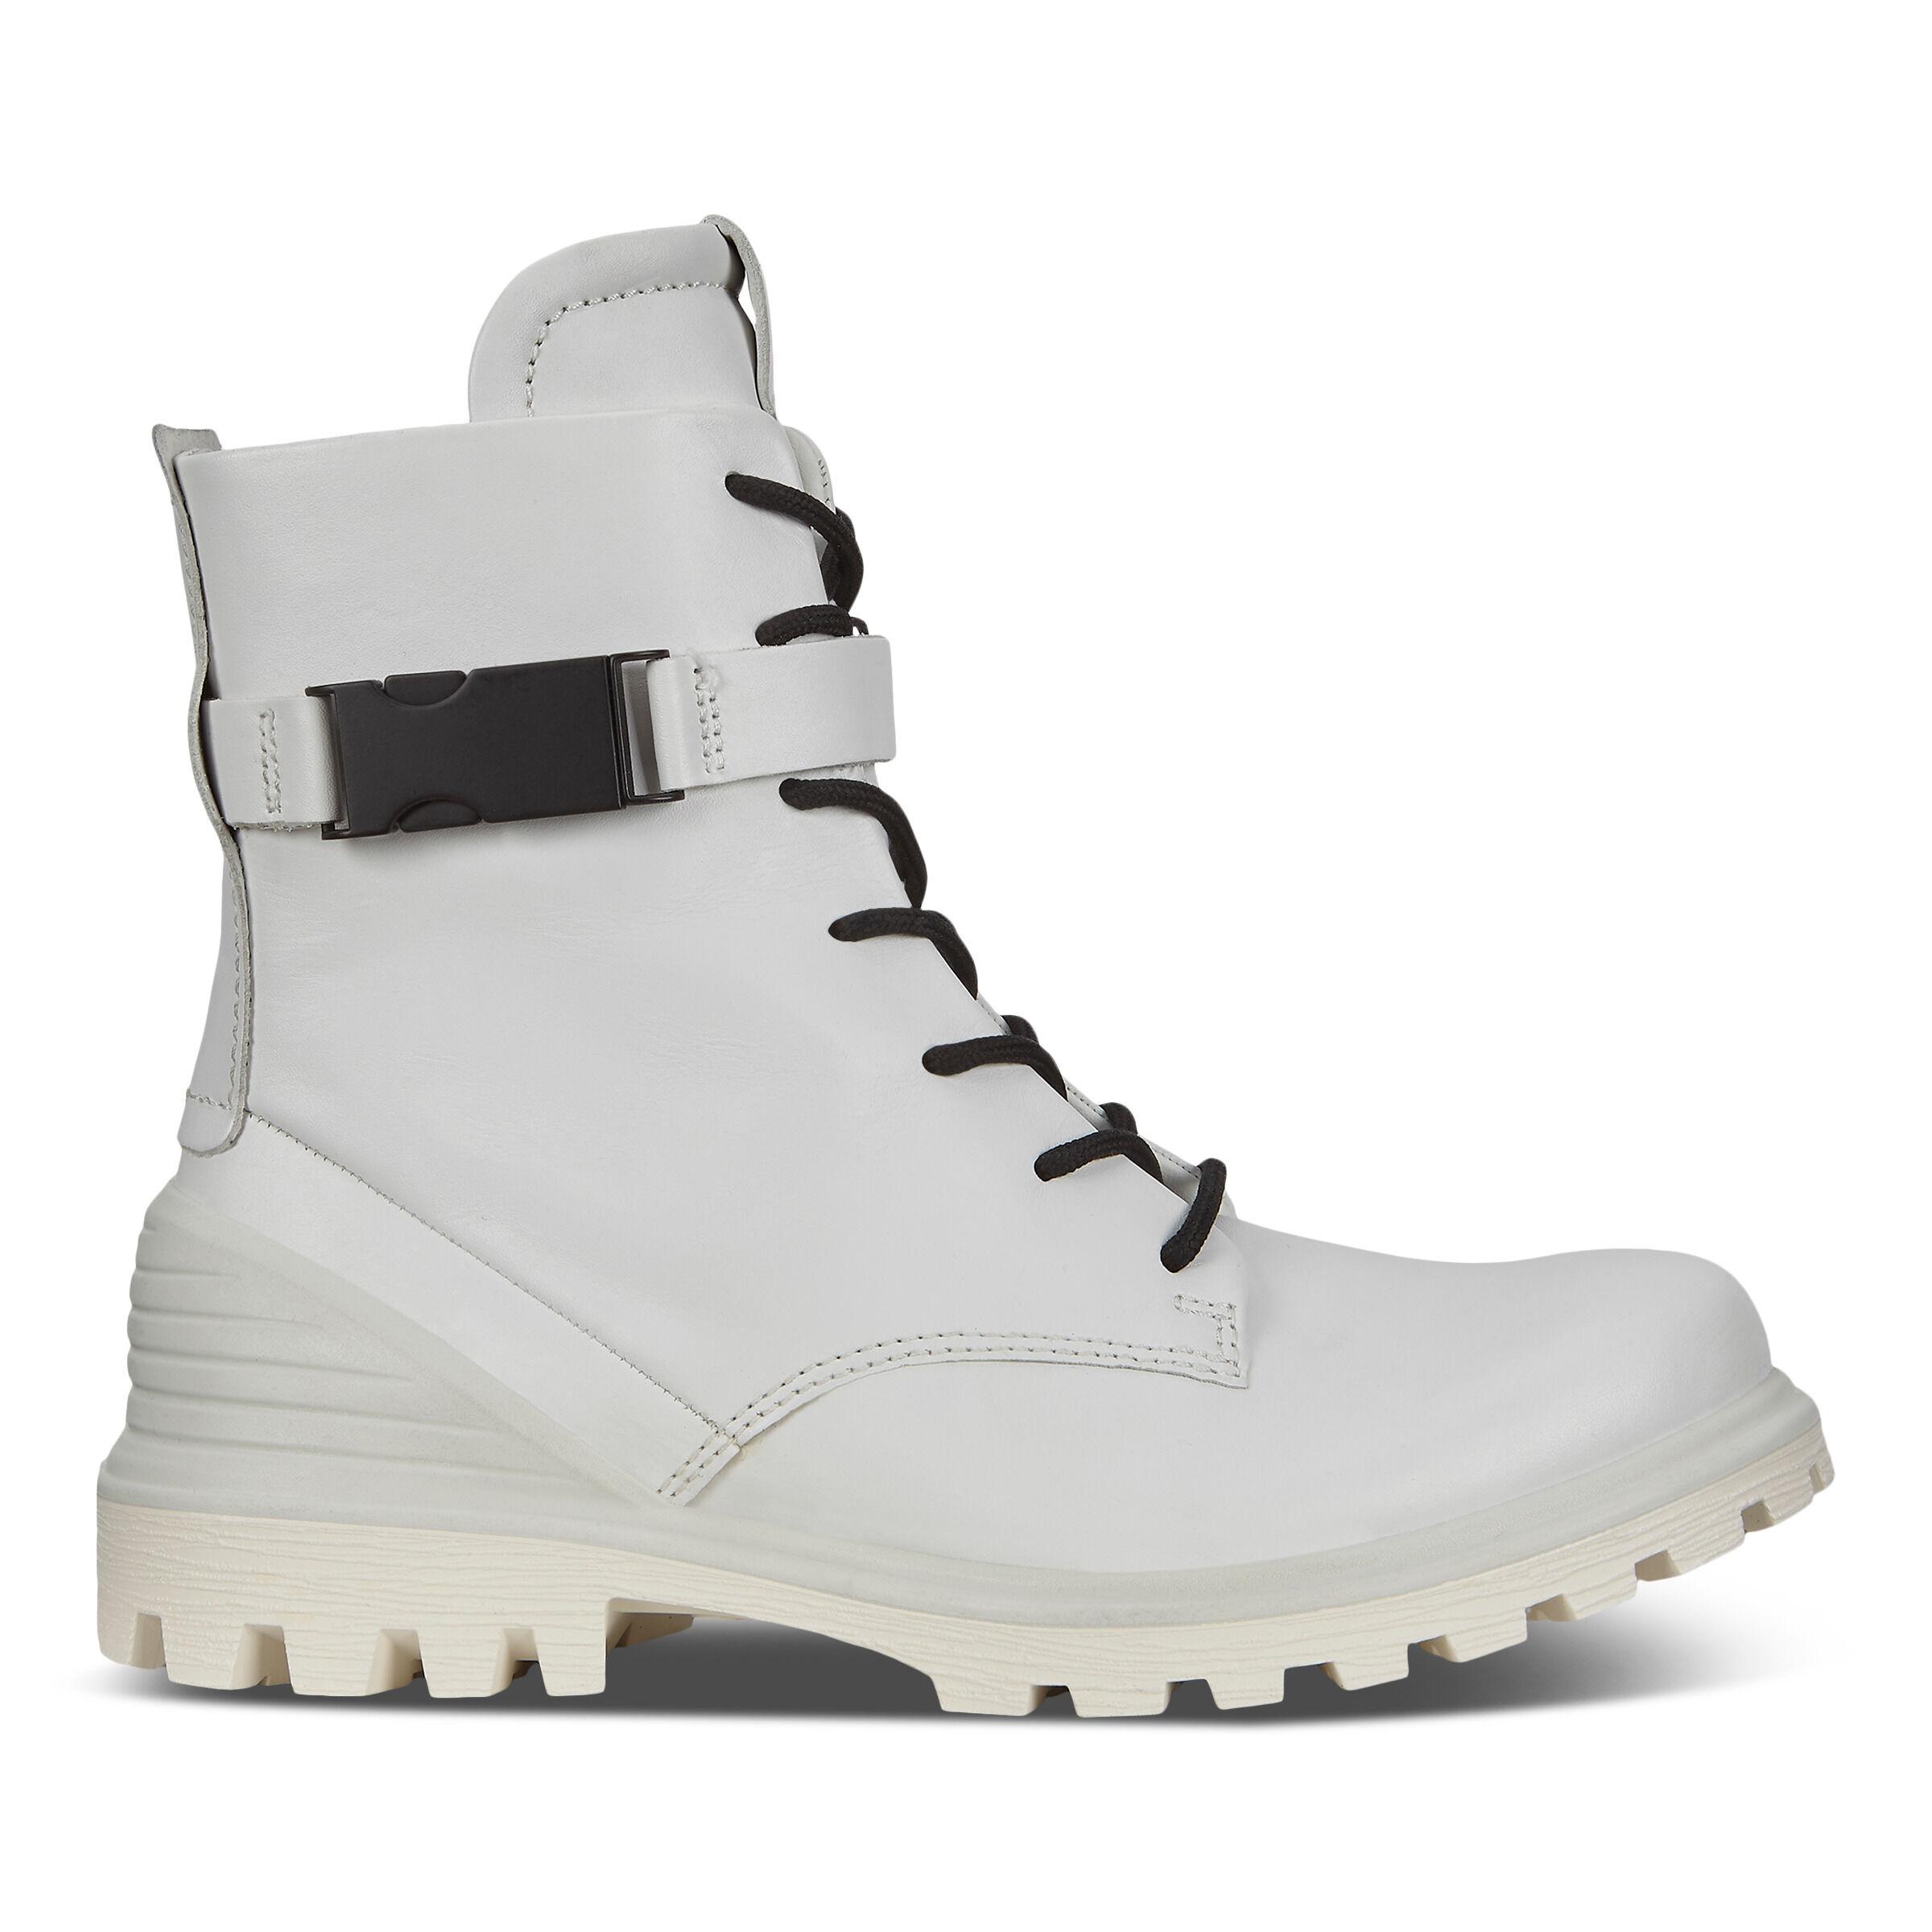 ecco ladies boots sale